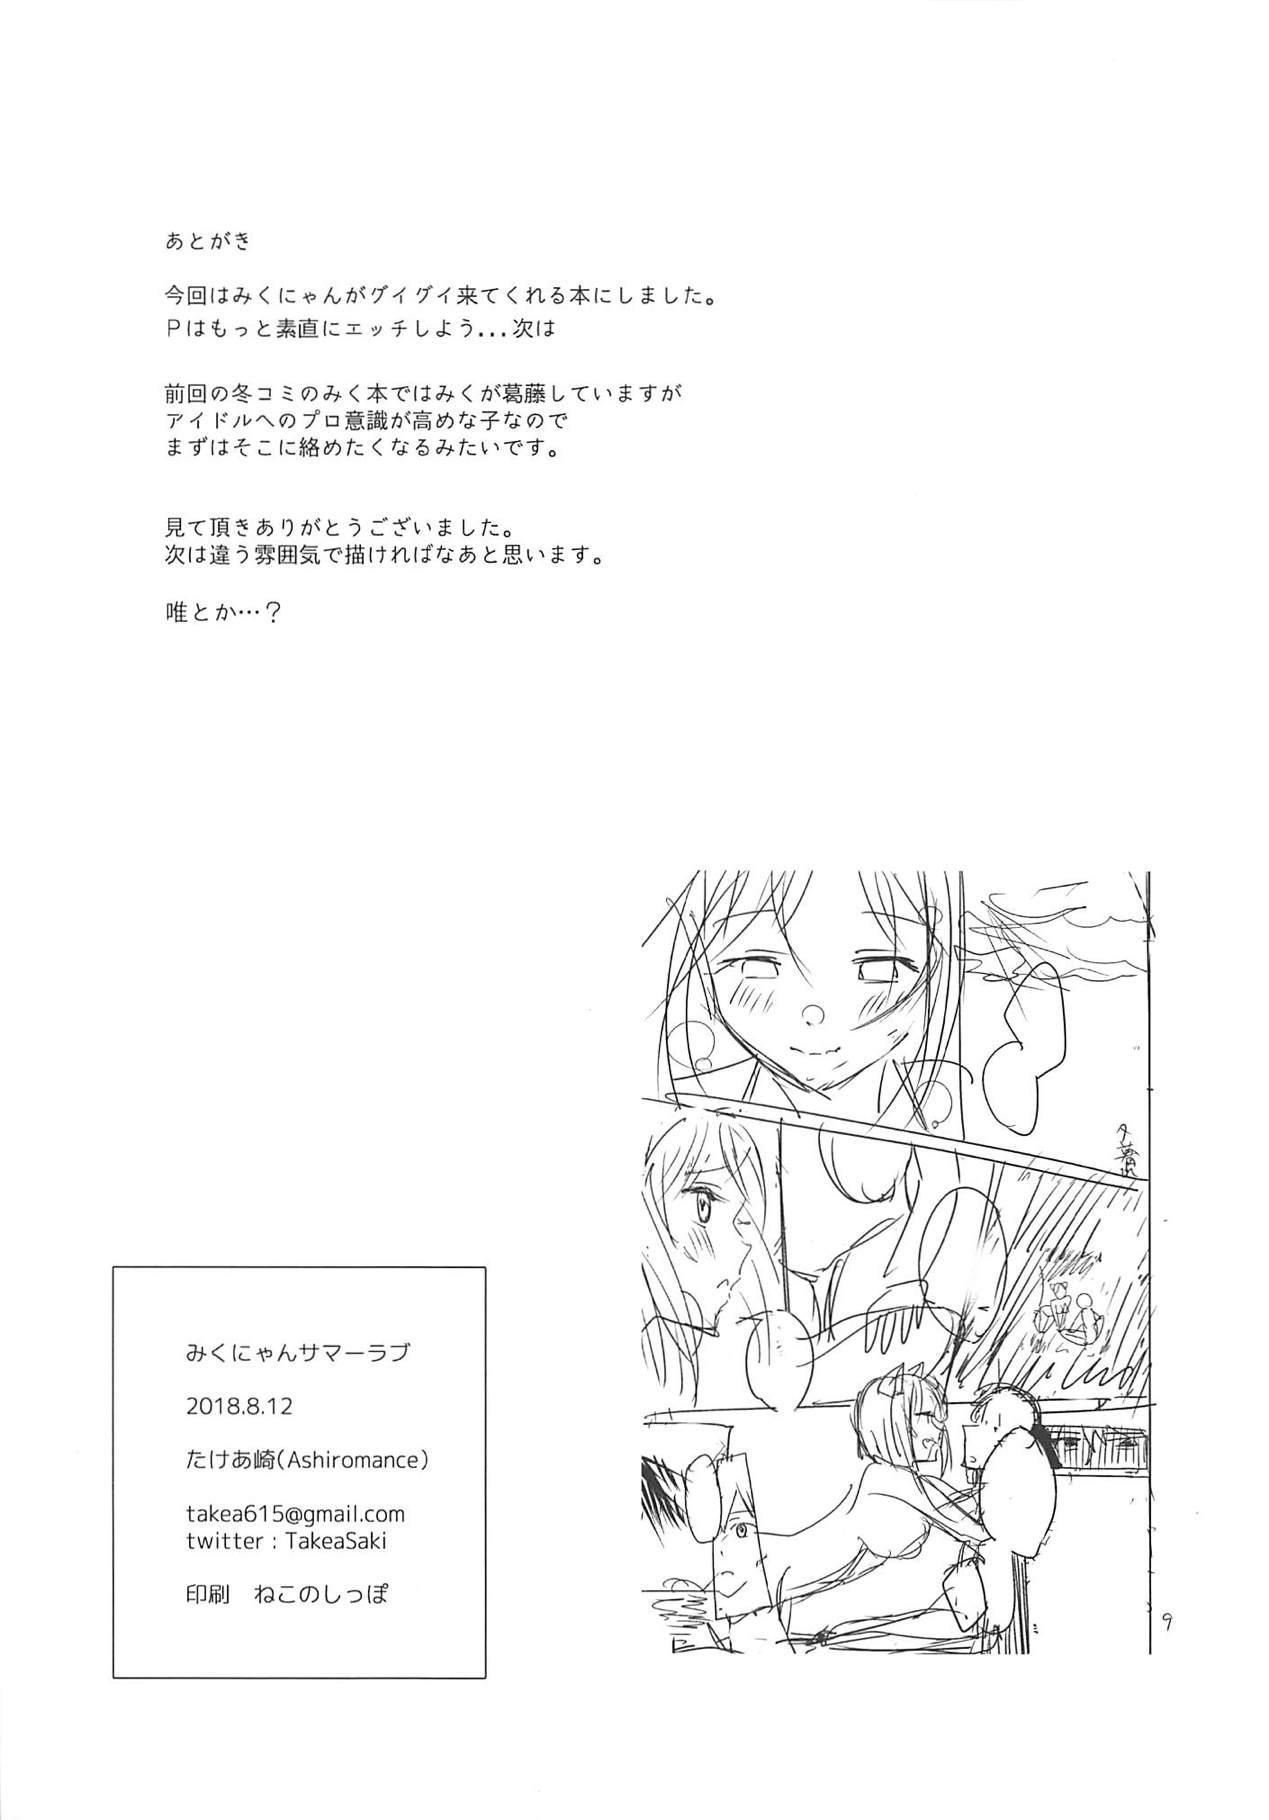 Miku-nyan Summer Love   前川未来的夏日爱情故事 17